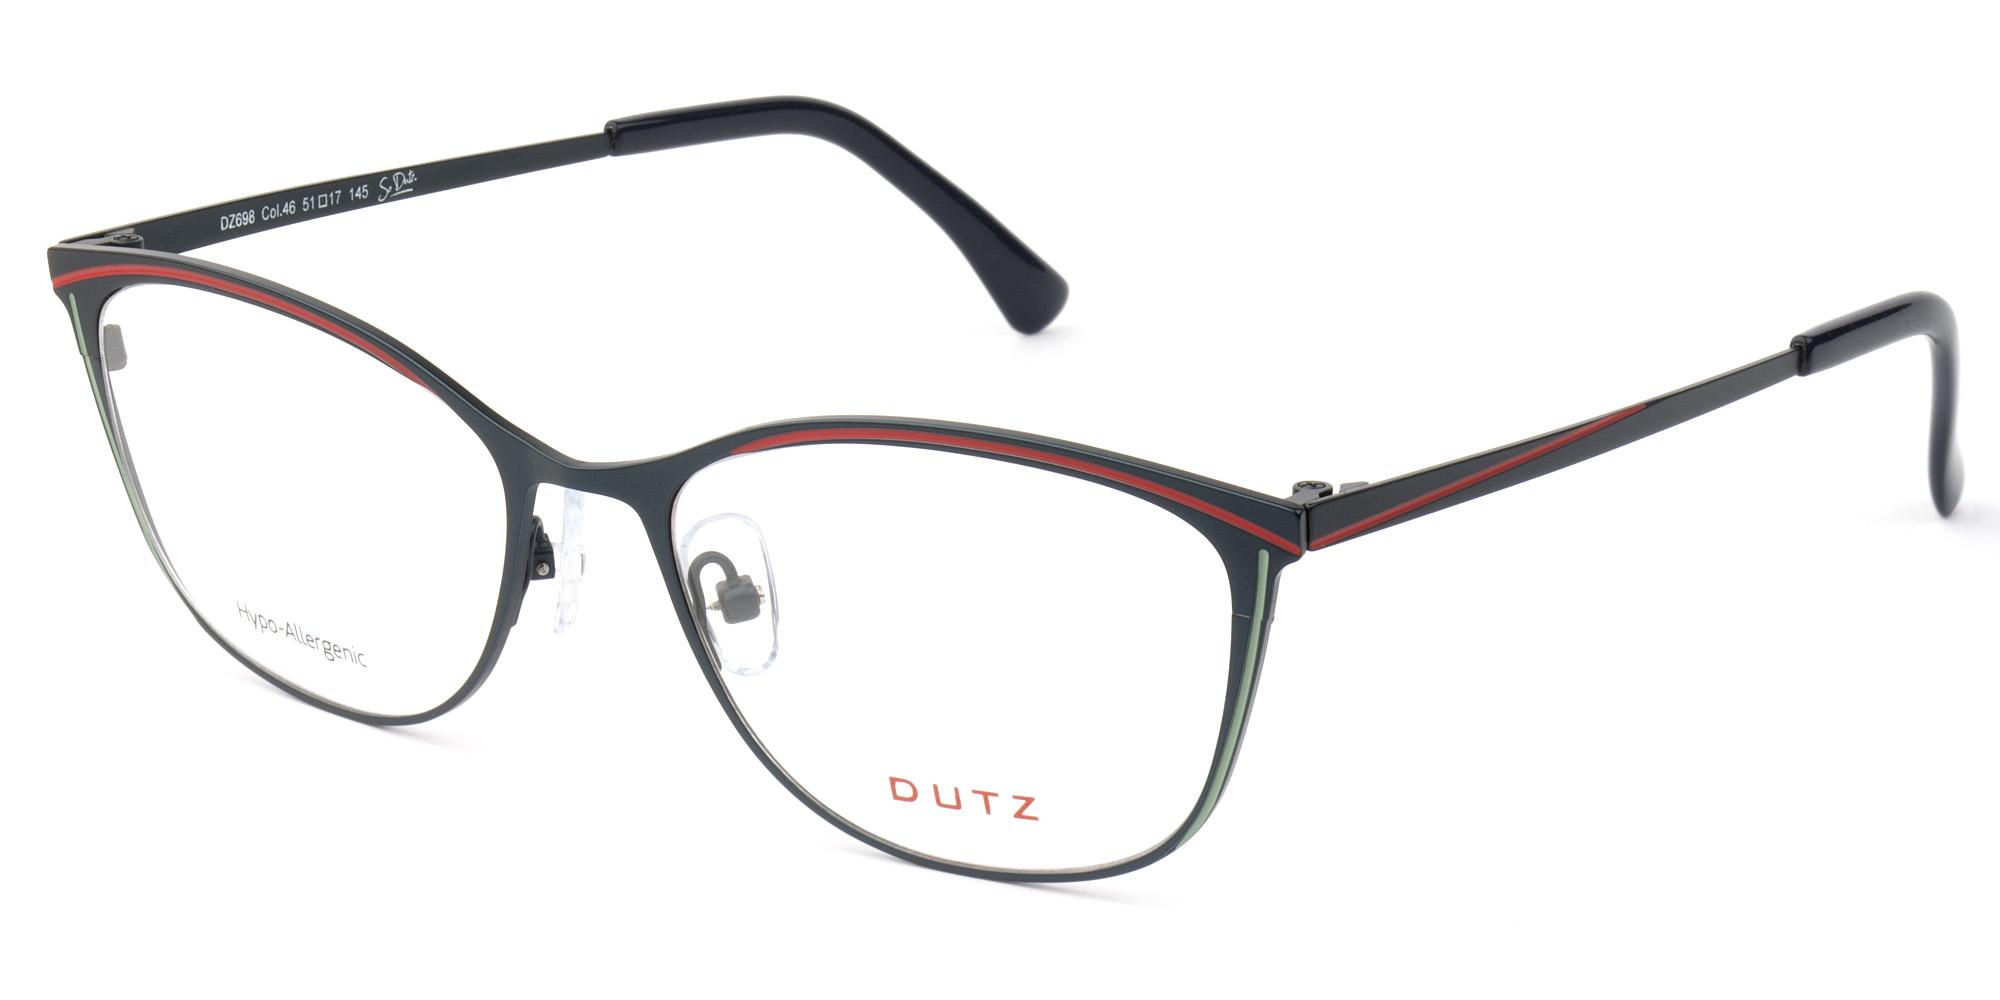 852968a02d2 BrillenEyes - BrillenEyes - Stylish European Eyewear